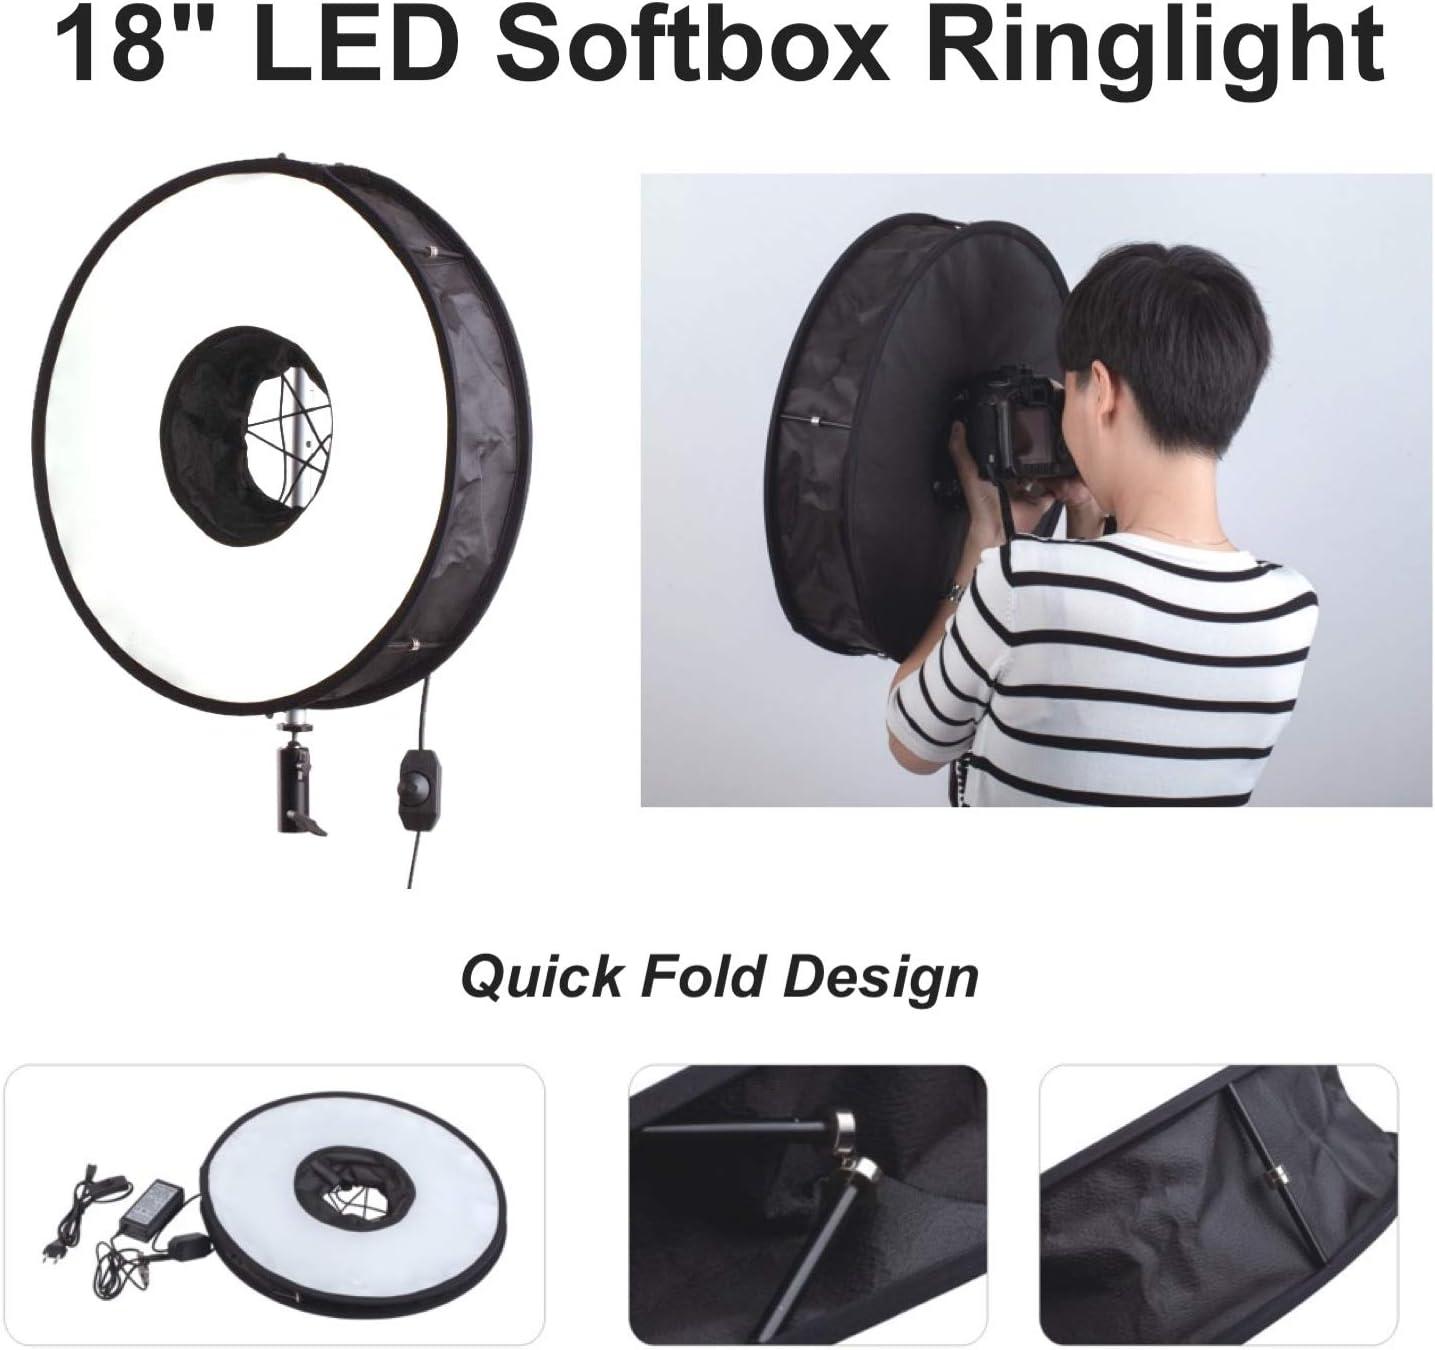 18 LED Ringlight Softbox Foldable Soft Box Photo Video Studio Photography